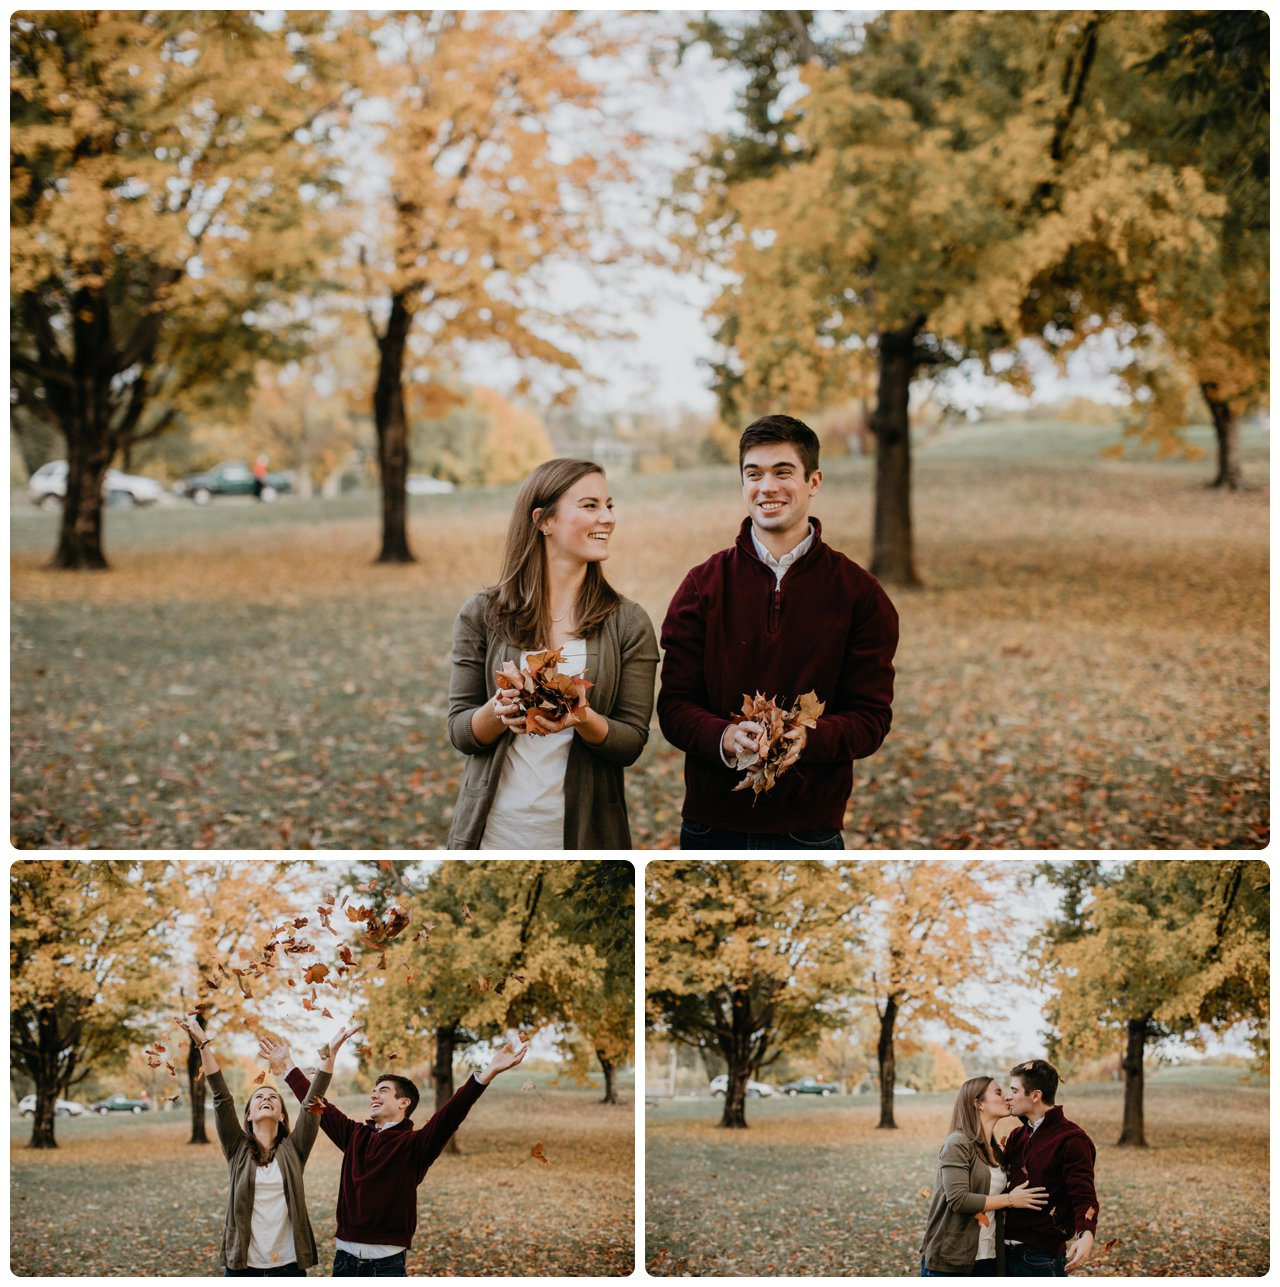 Engagement-Wedding-Photographer-Virginia-Best-Pat-Cori-Photography-012.jpg